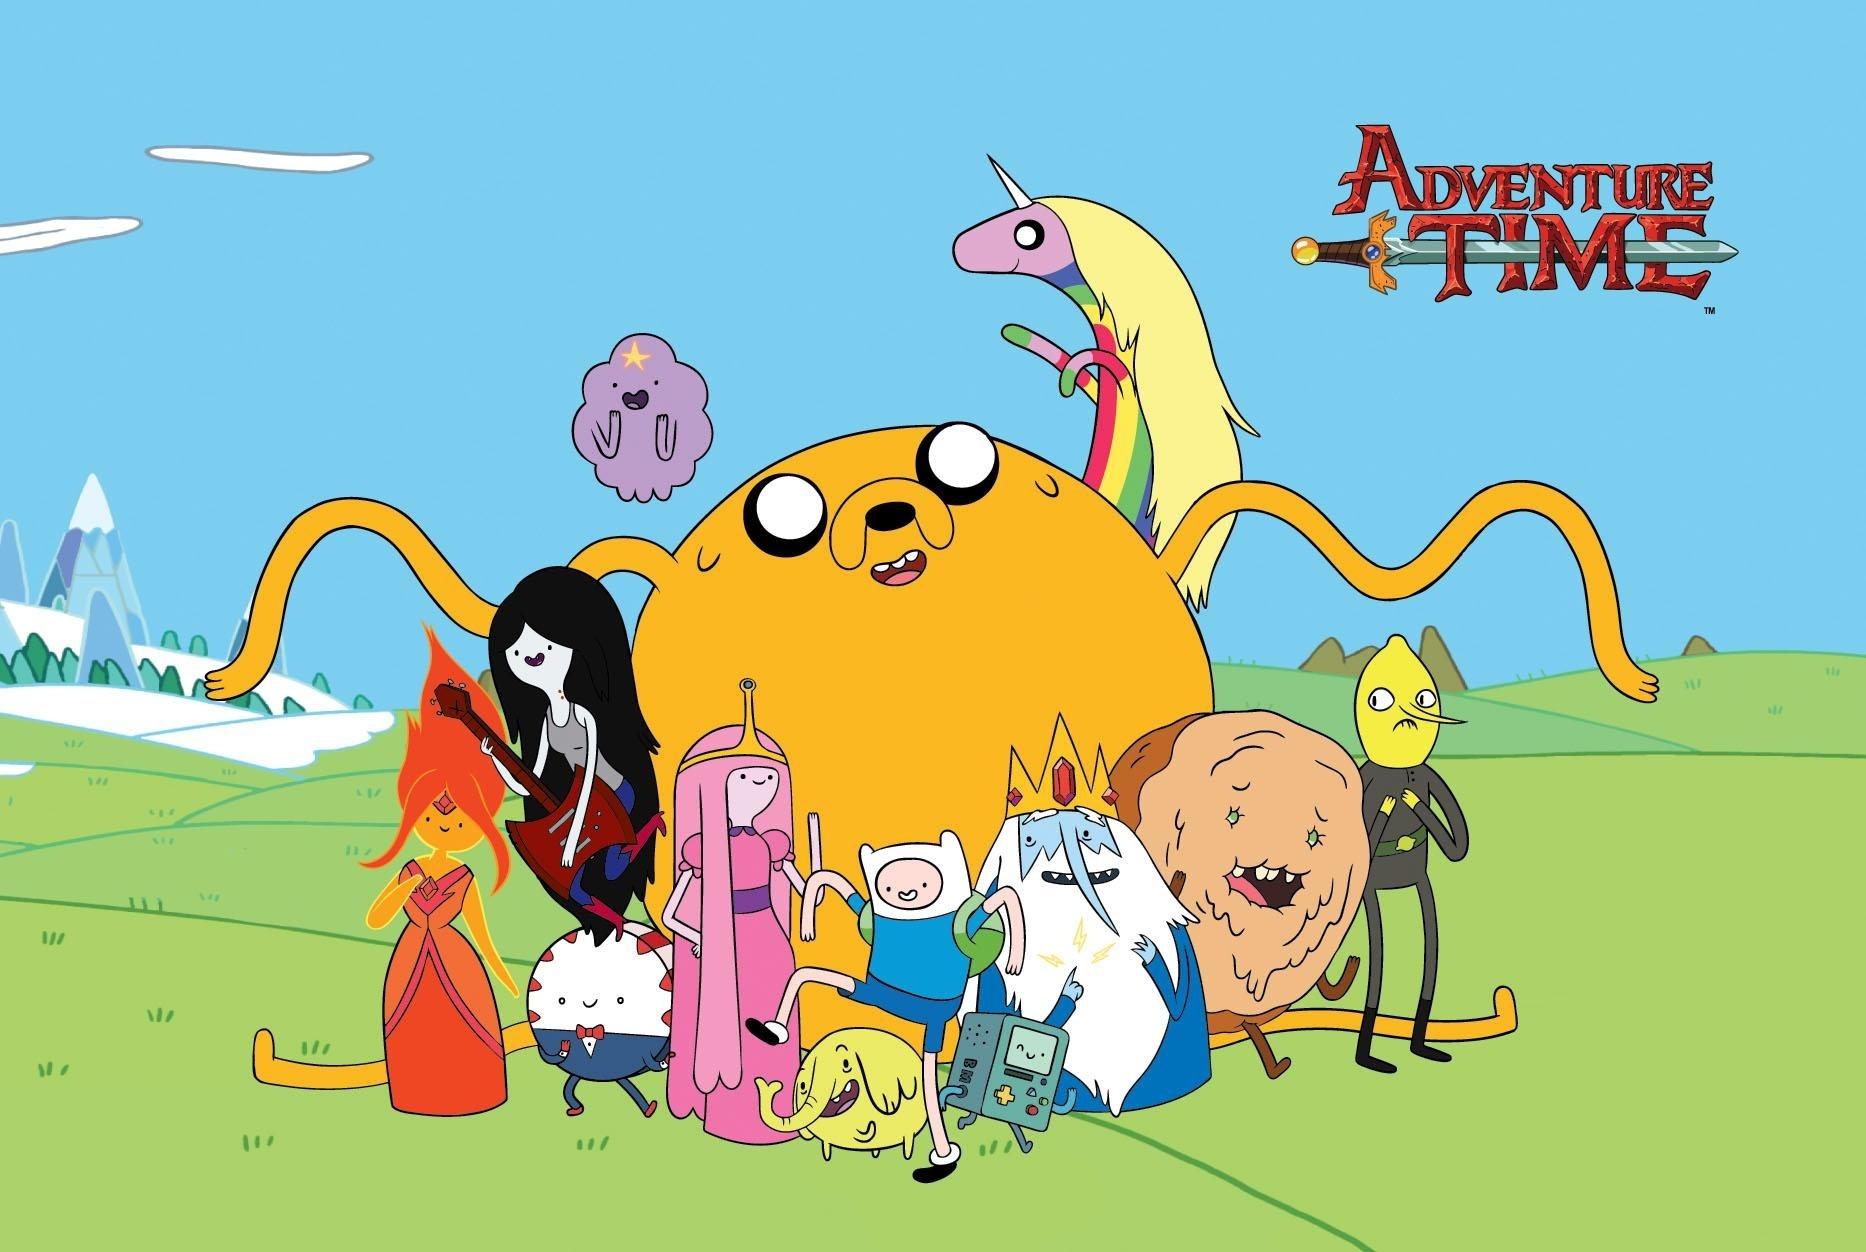 《Adventure time》,一部蘑菇雲升起後的胡逼動畫